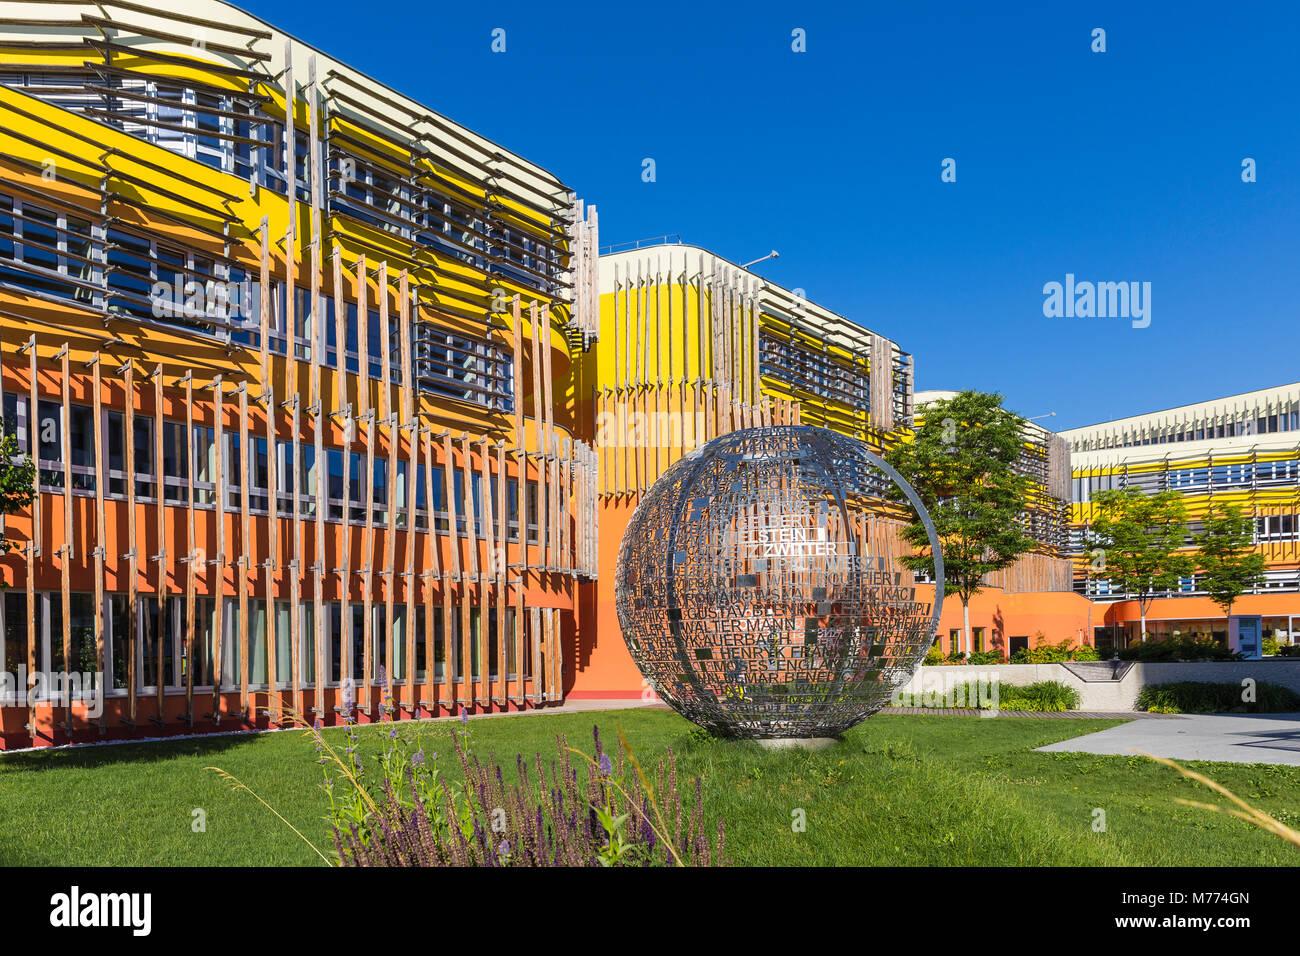 Vienna University of Economics and Business, Vienna, Austria, Europe - Stock Image